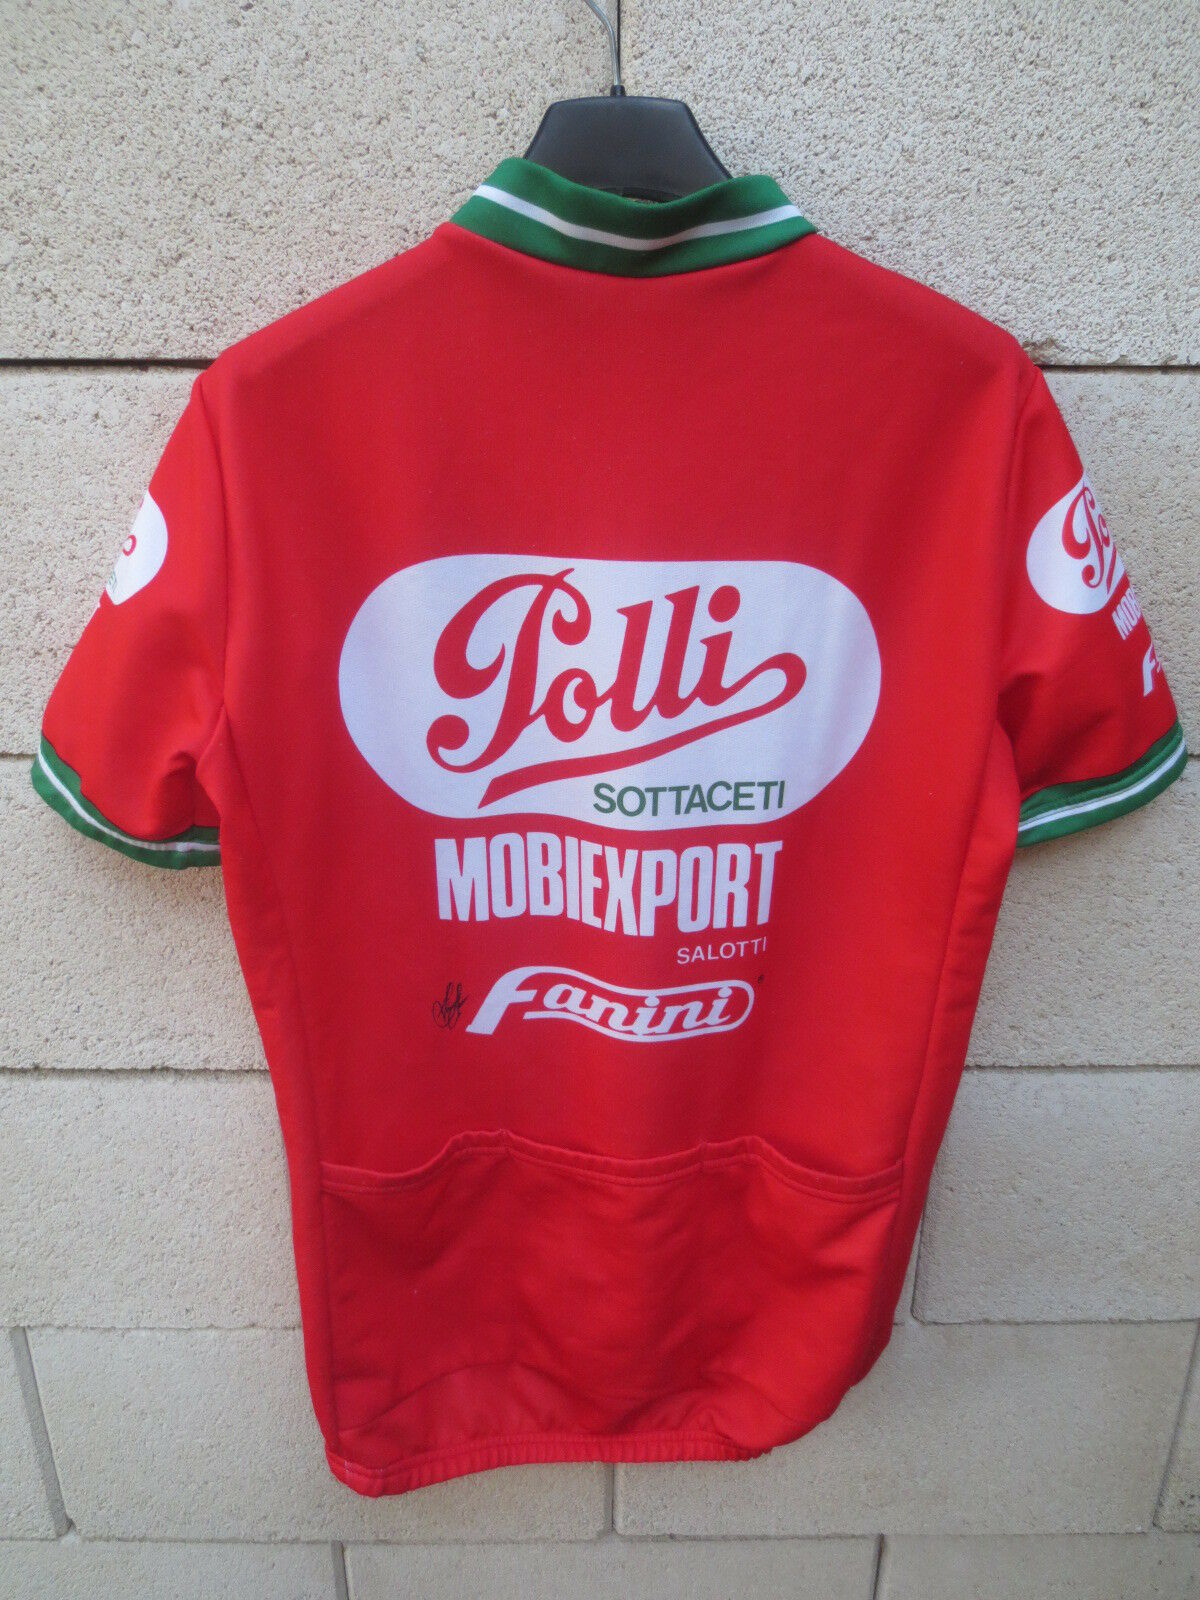 Maillot MOBIEXPORT cycliste POLLI MOBIEXPORT Maillot 1989 vintage camiseta  shirt cycling trikot 4 b7251e